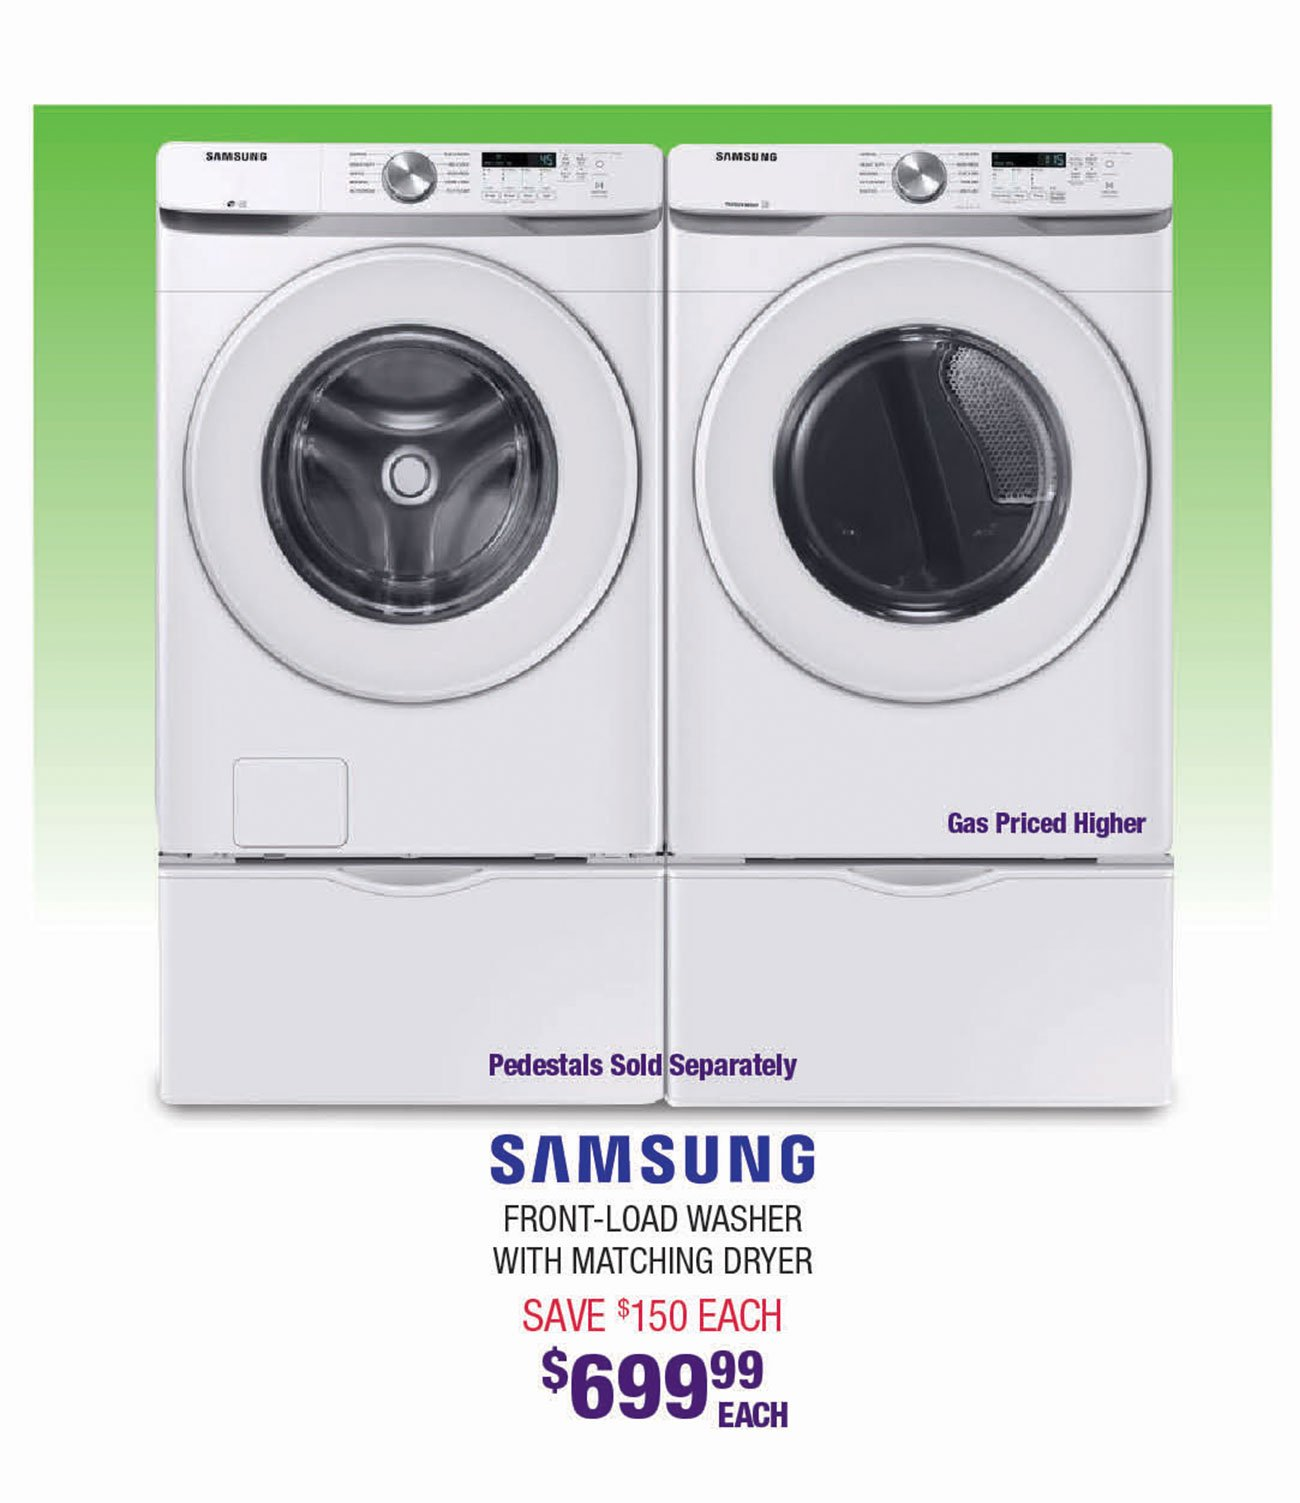 Samsung-Front-Load-Washer-Dryer-UIRV